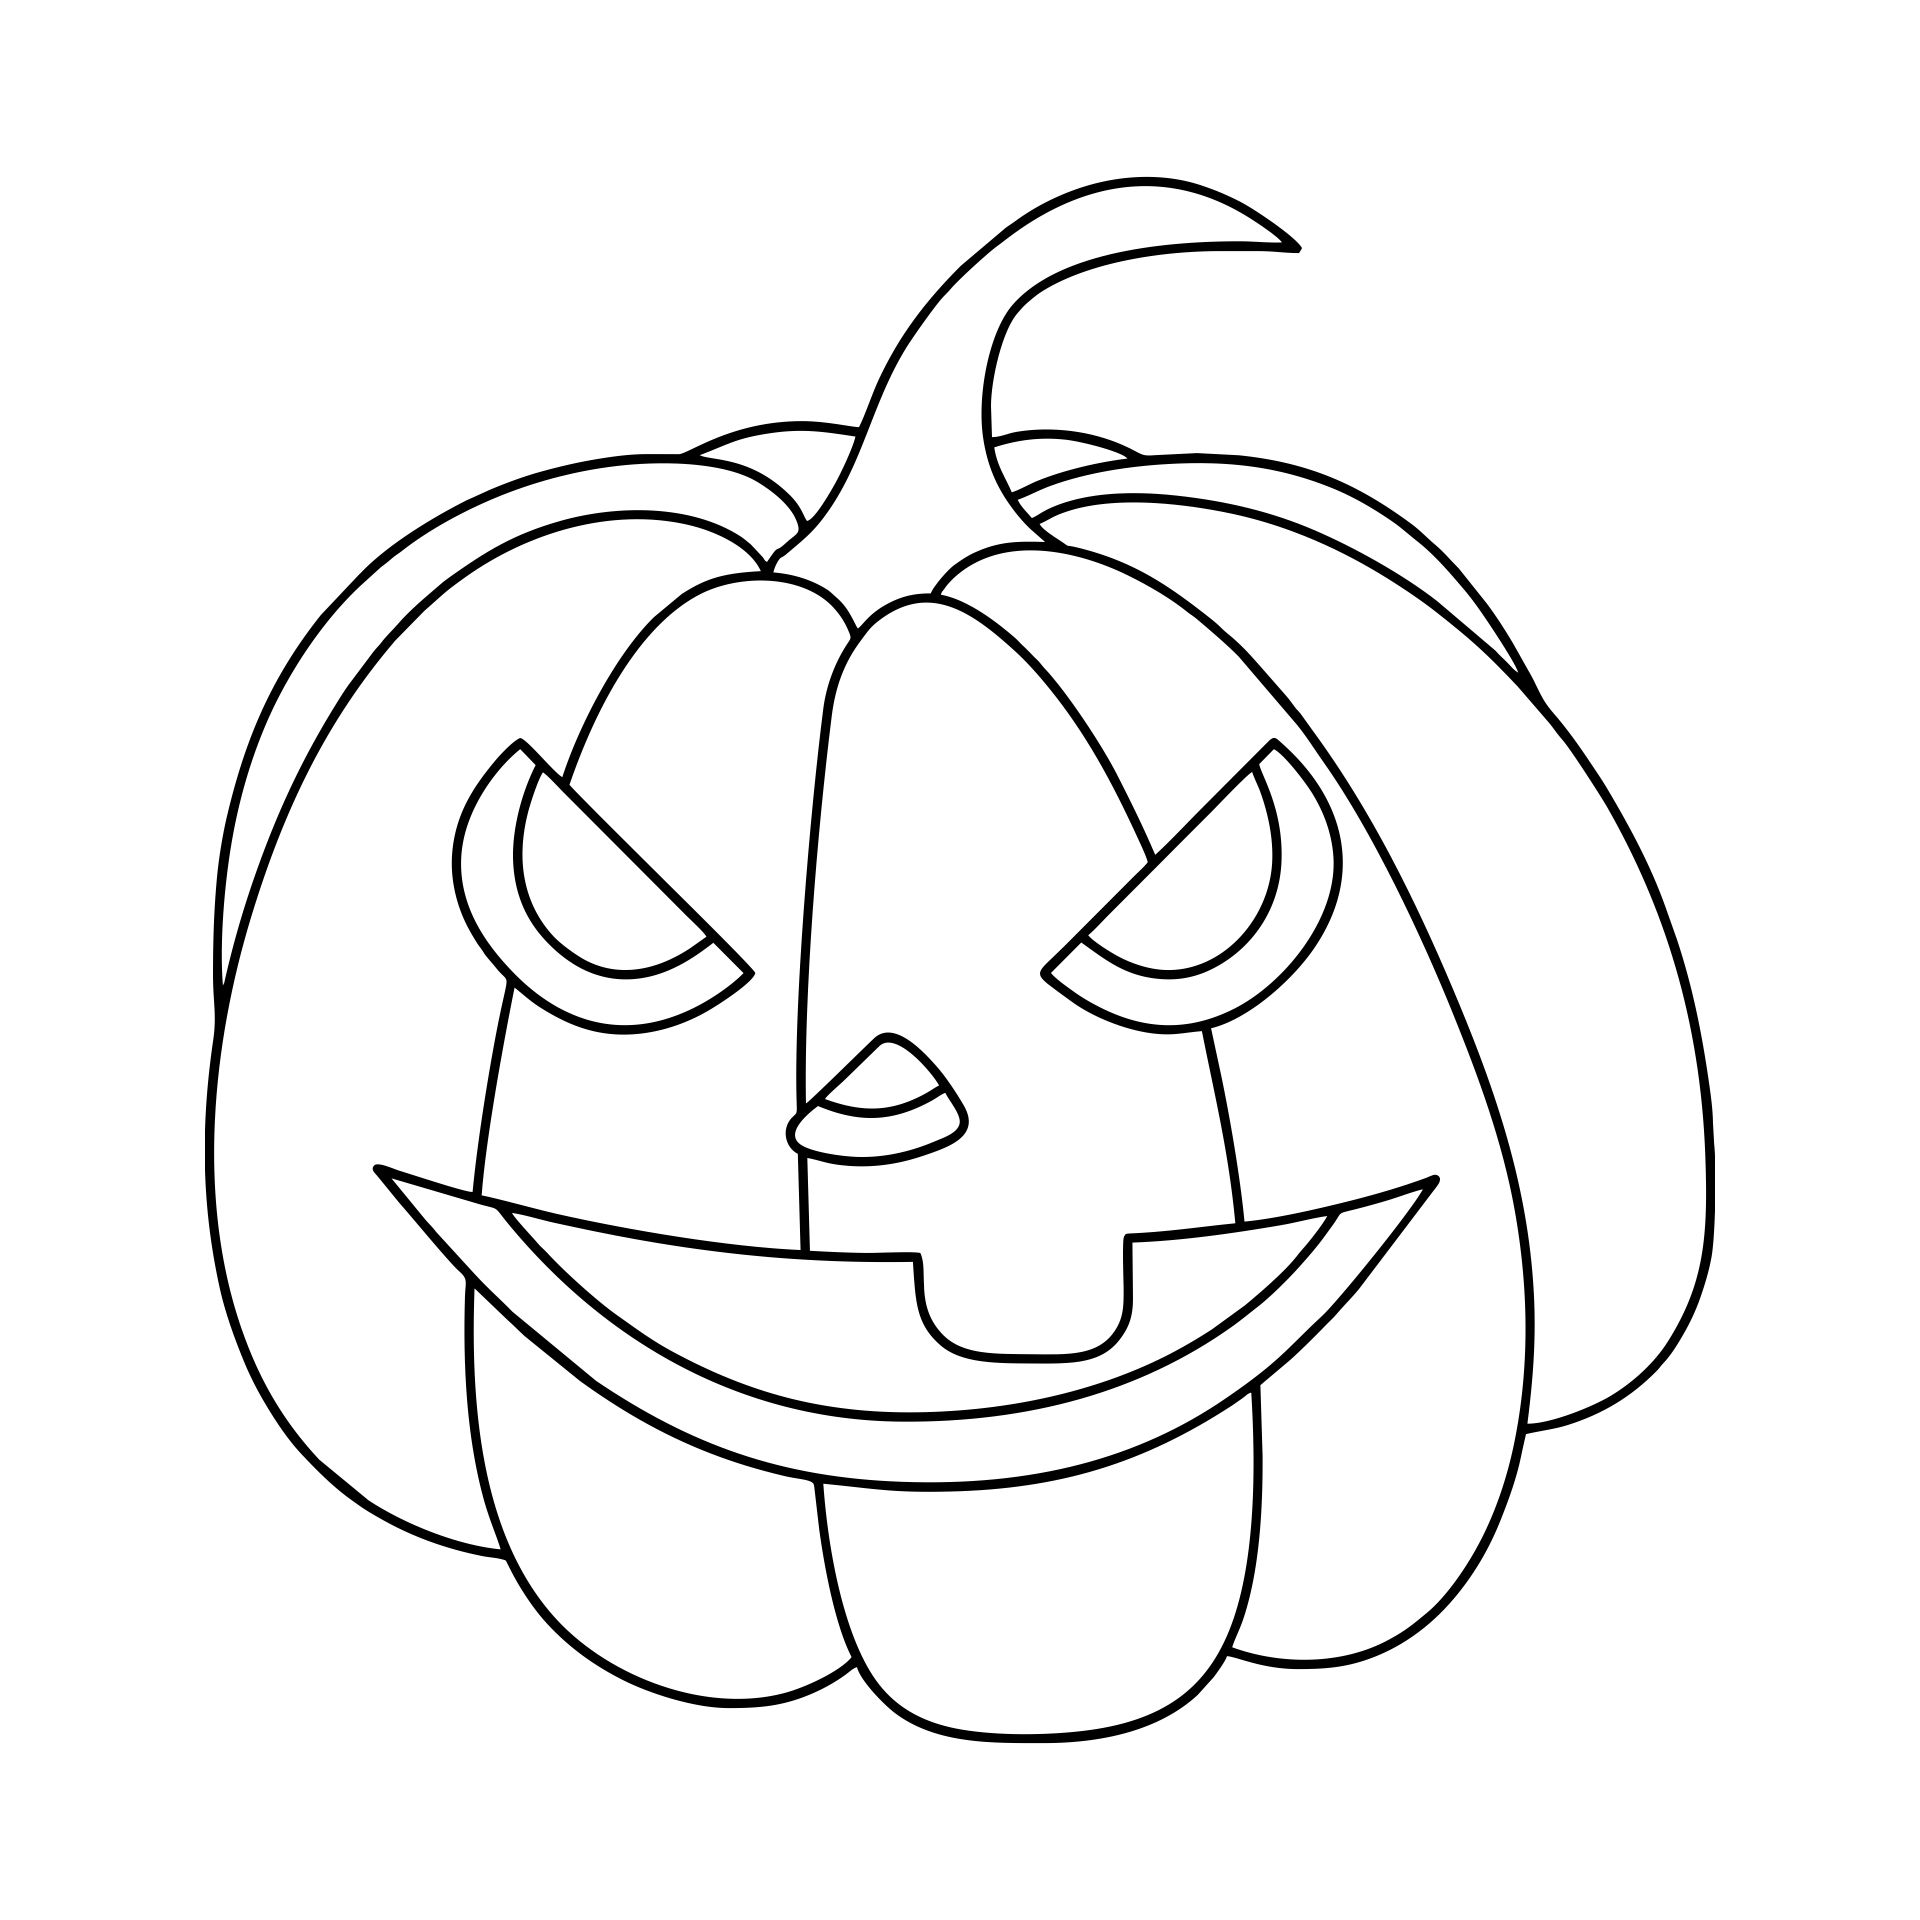 4 Images of Pumpkin Halloween Mask Templates Printable